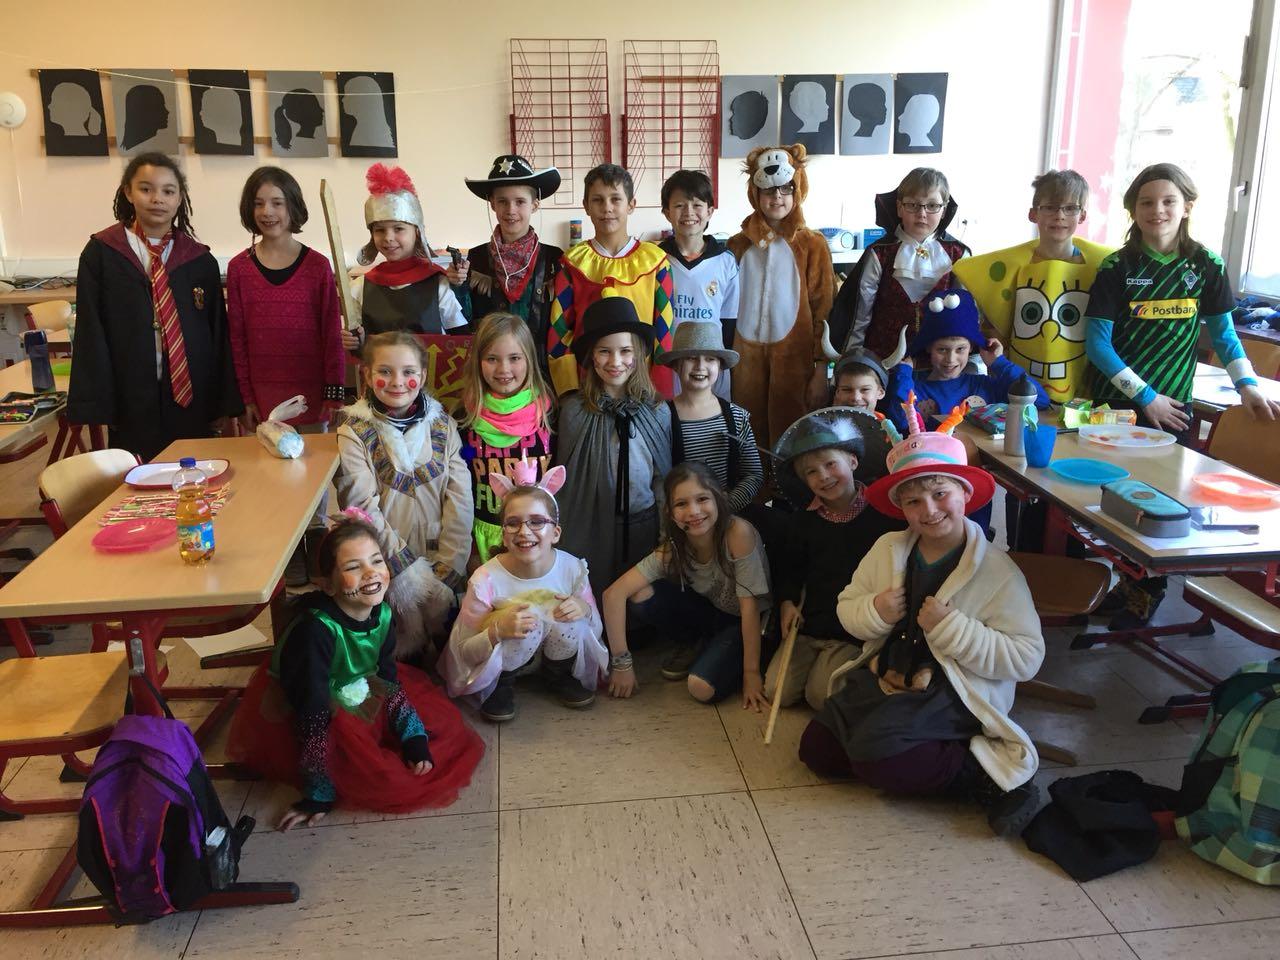 Gruppenbild Klasse 4